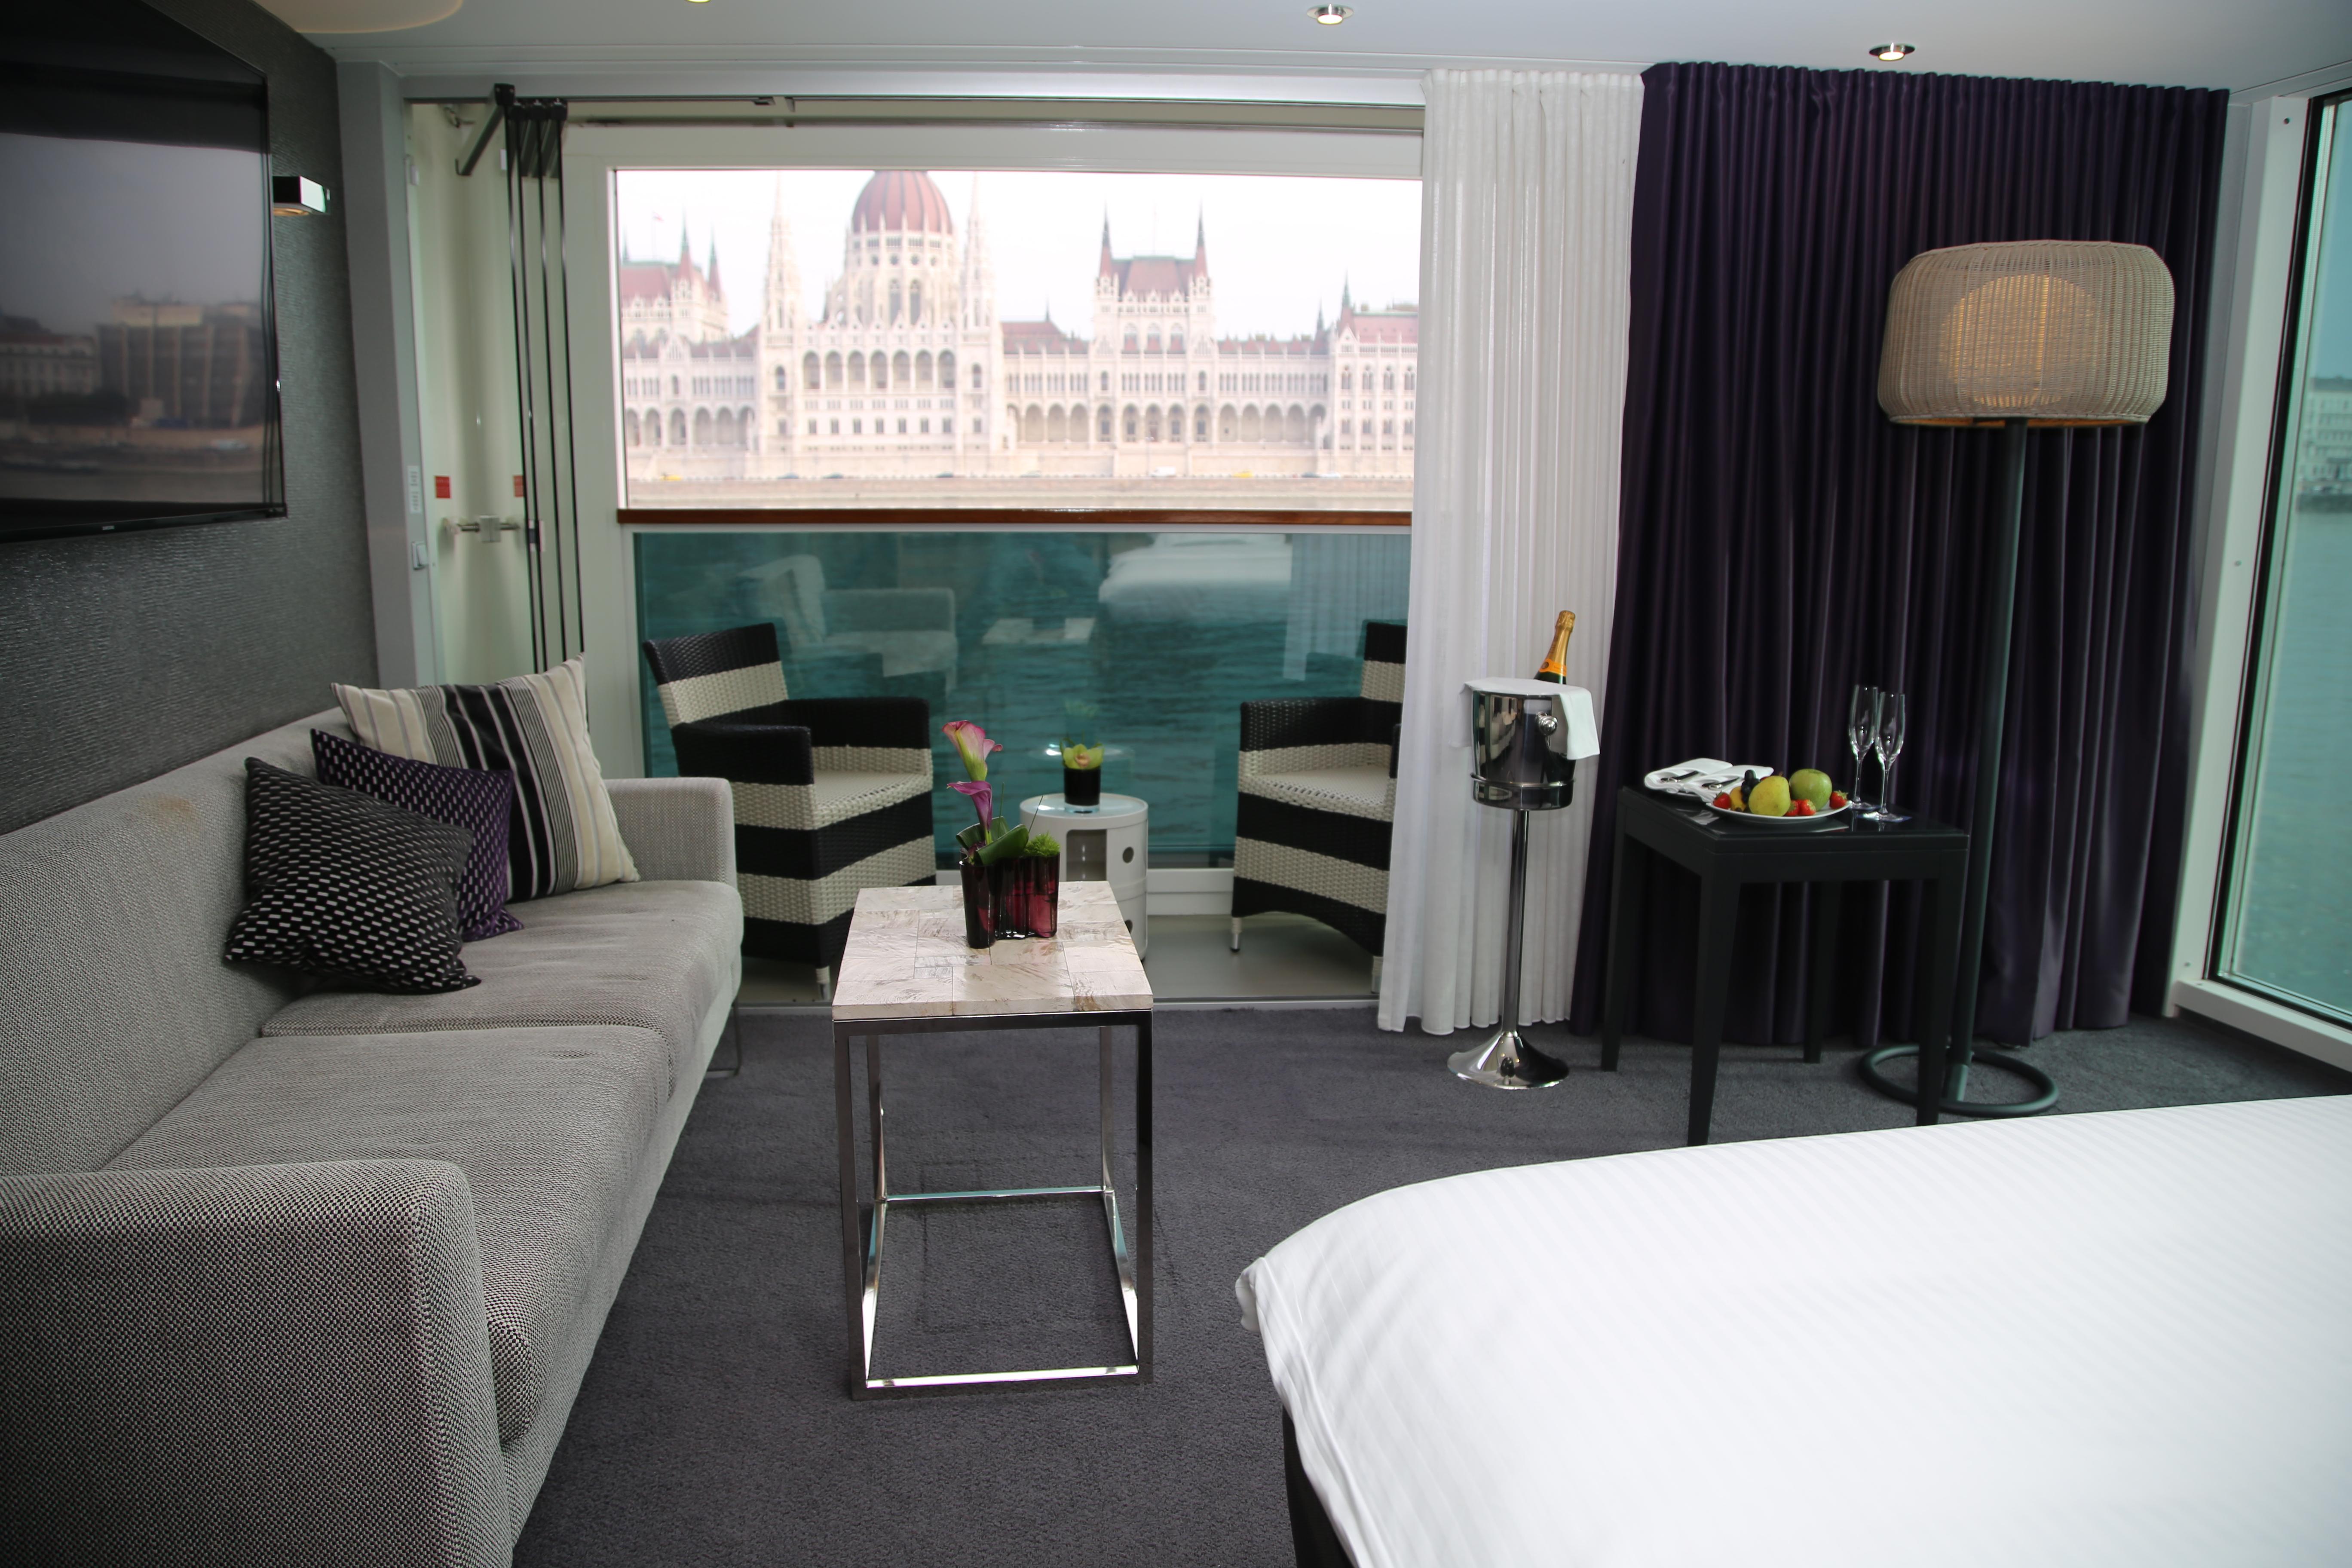 Scenic Crystal Scenic Jewel Scenic Jade Accommodation Royal Panorama Suite 1.JPG